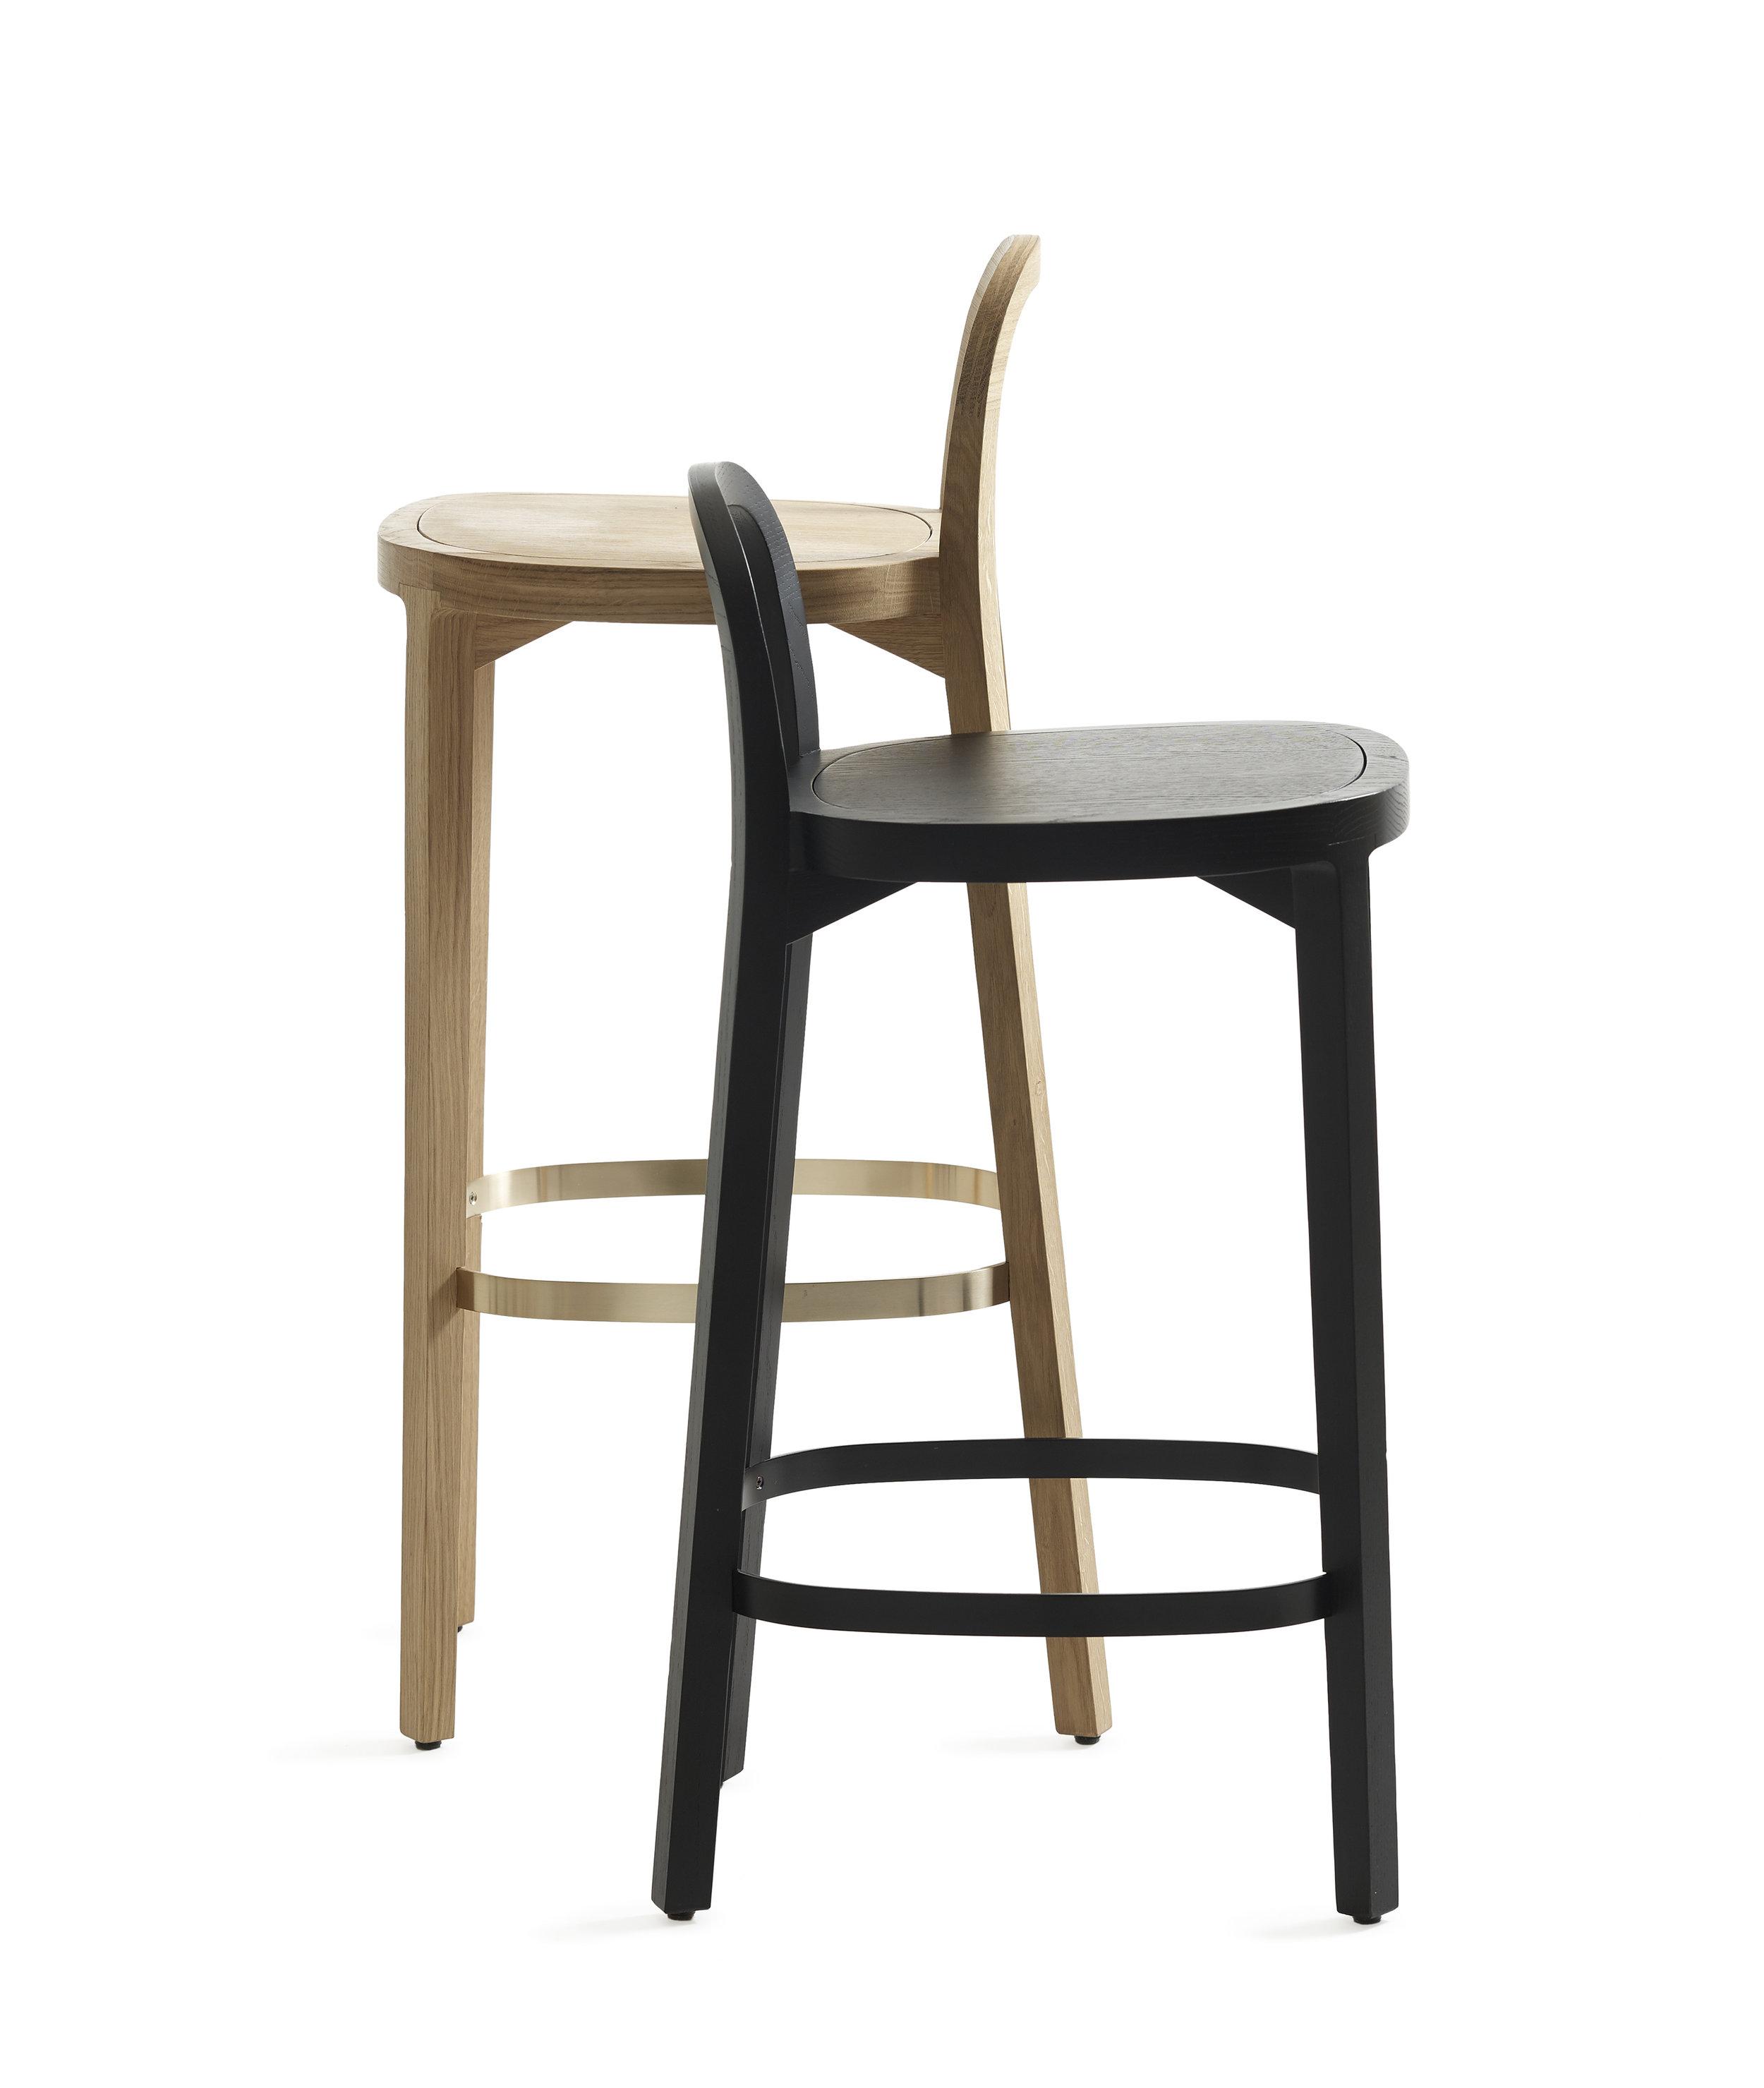 Siro+ bar stools